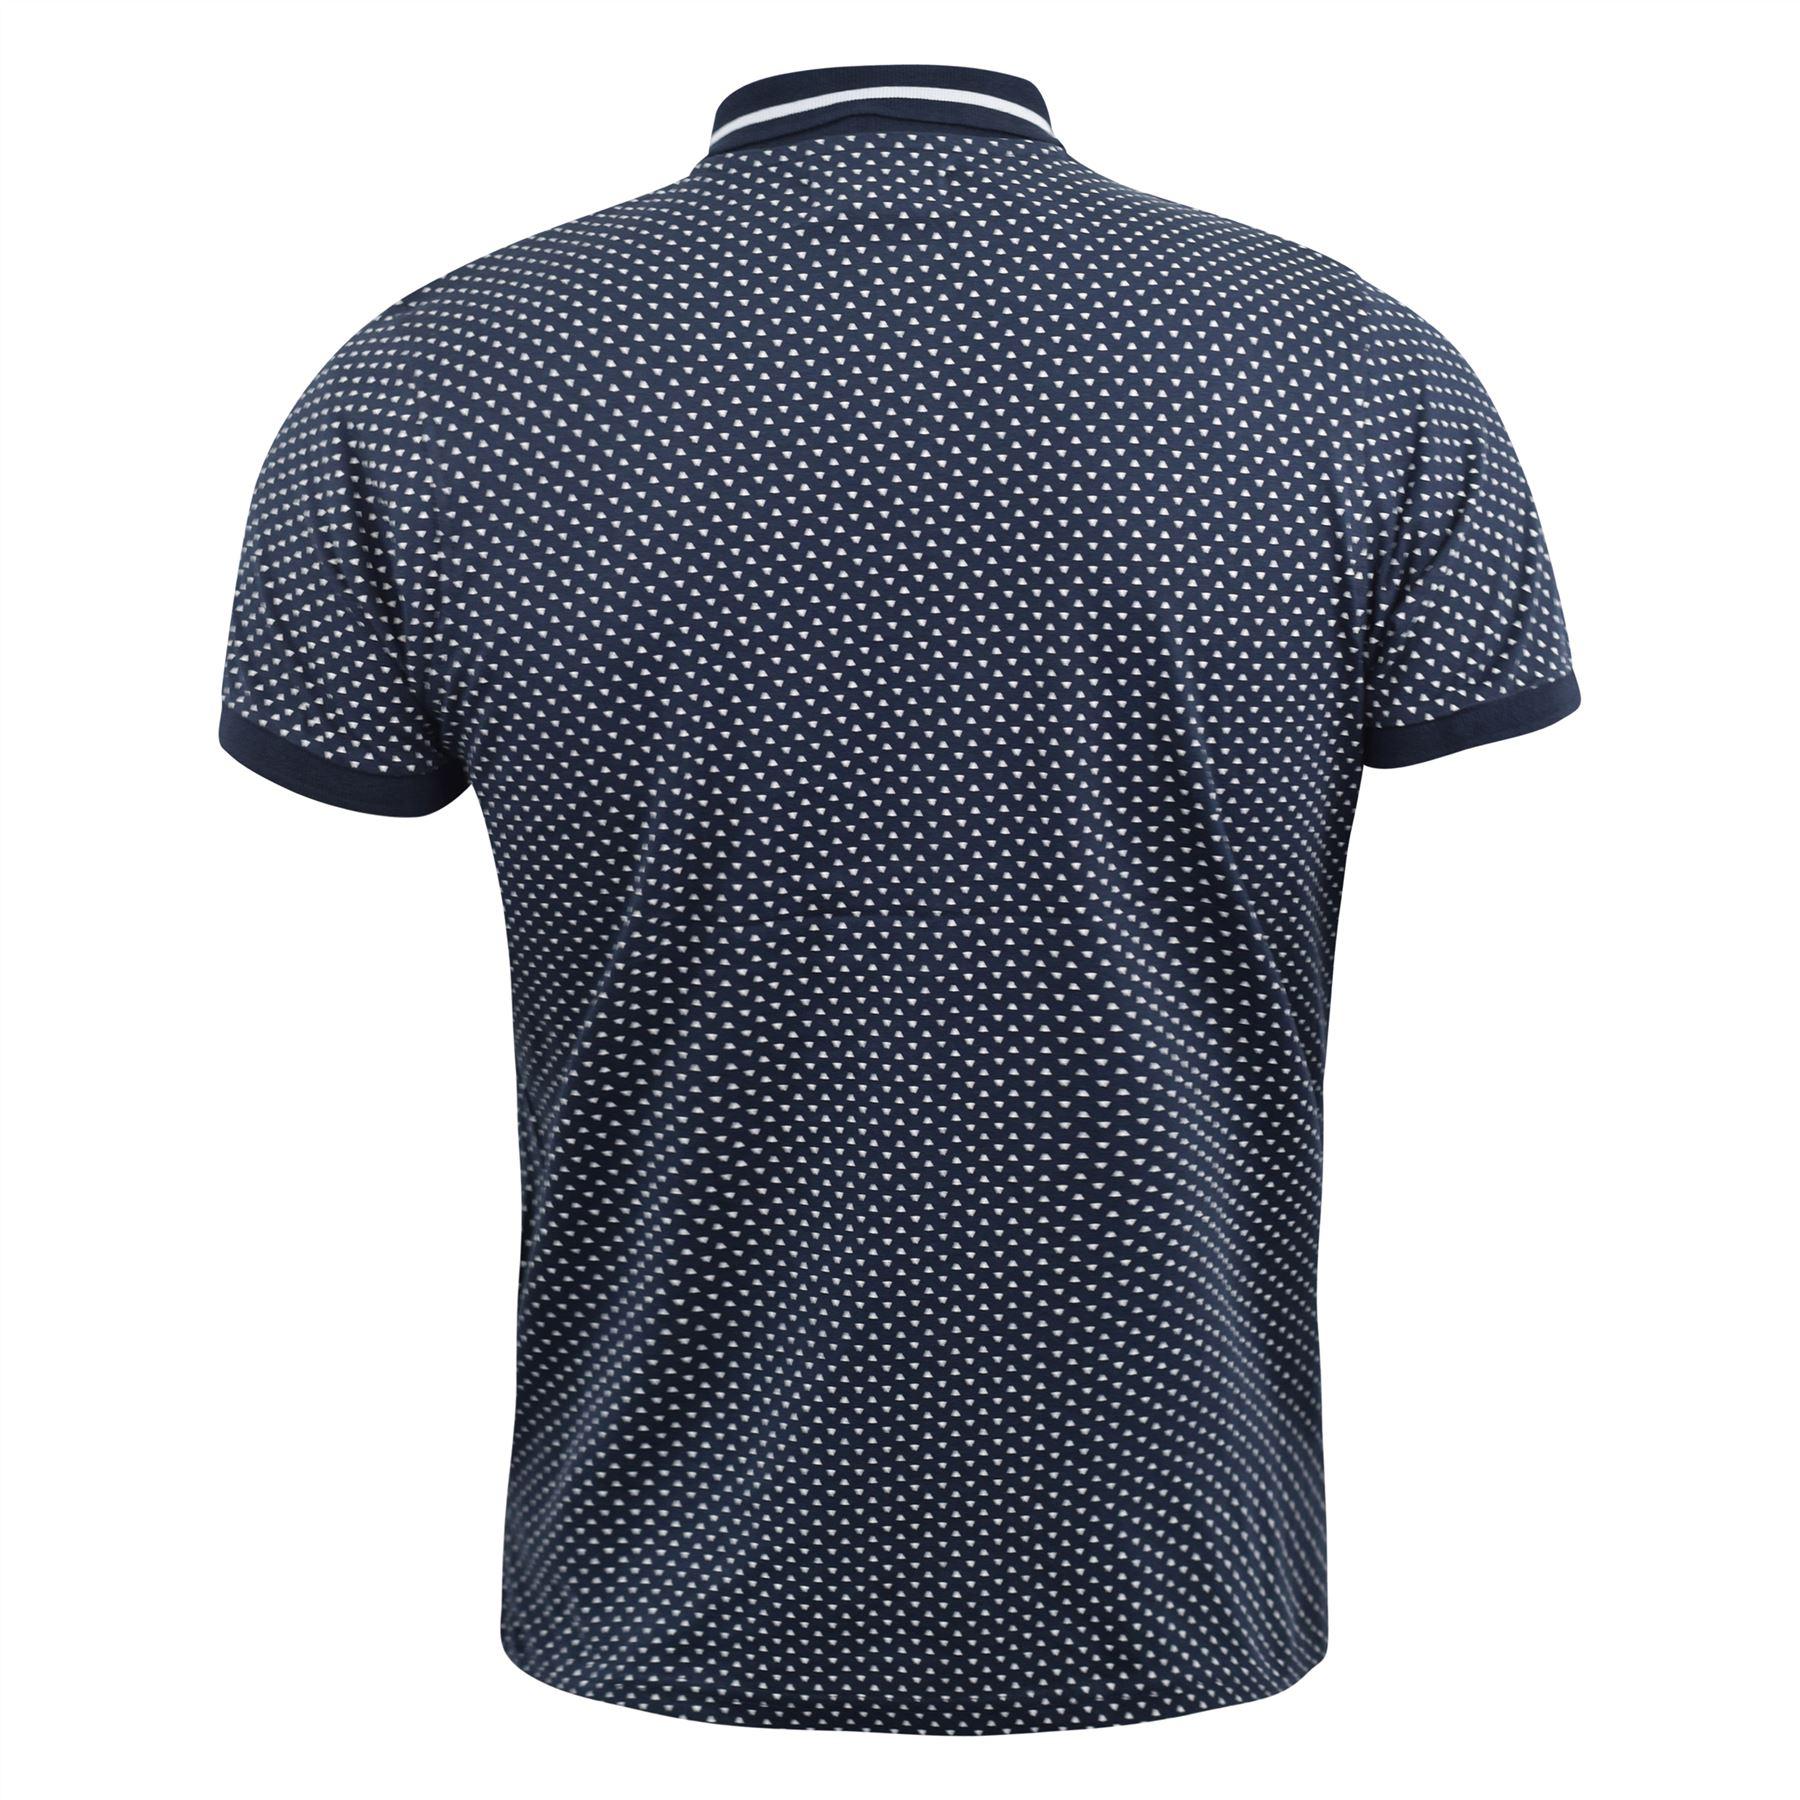 Mens-Polo-Shirt-kangol-Short-Sleeve-T-Shirt-Top-Saint thumbnail 5